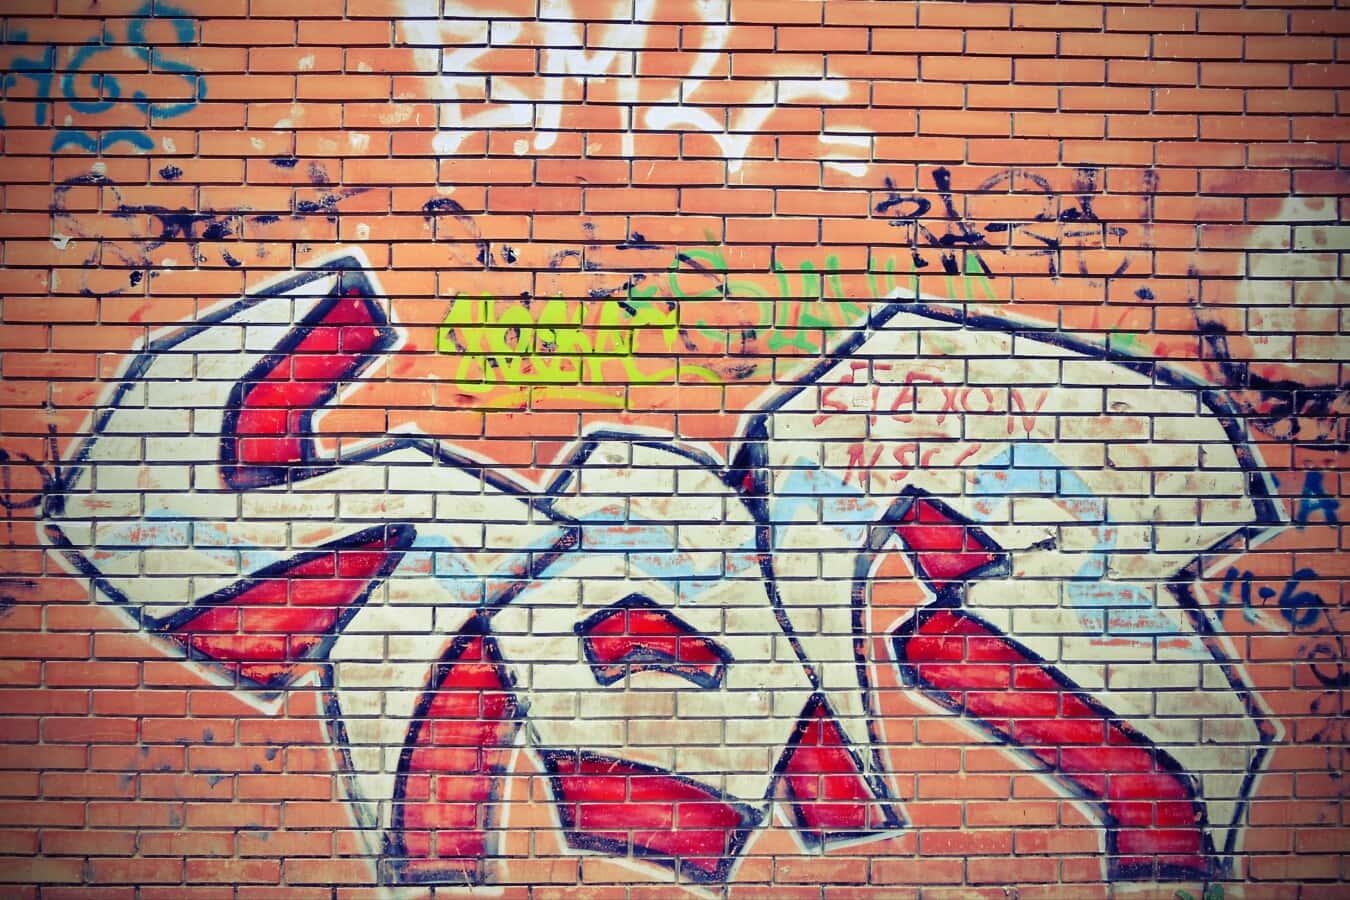 masonry, wall, bricks, vandalism, graffiti, decay, visual, abstract, brick, pattern